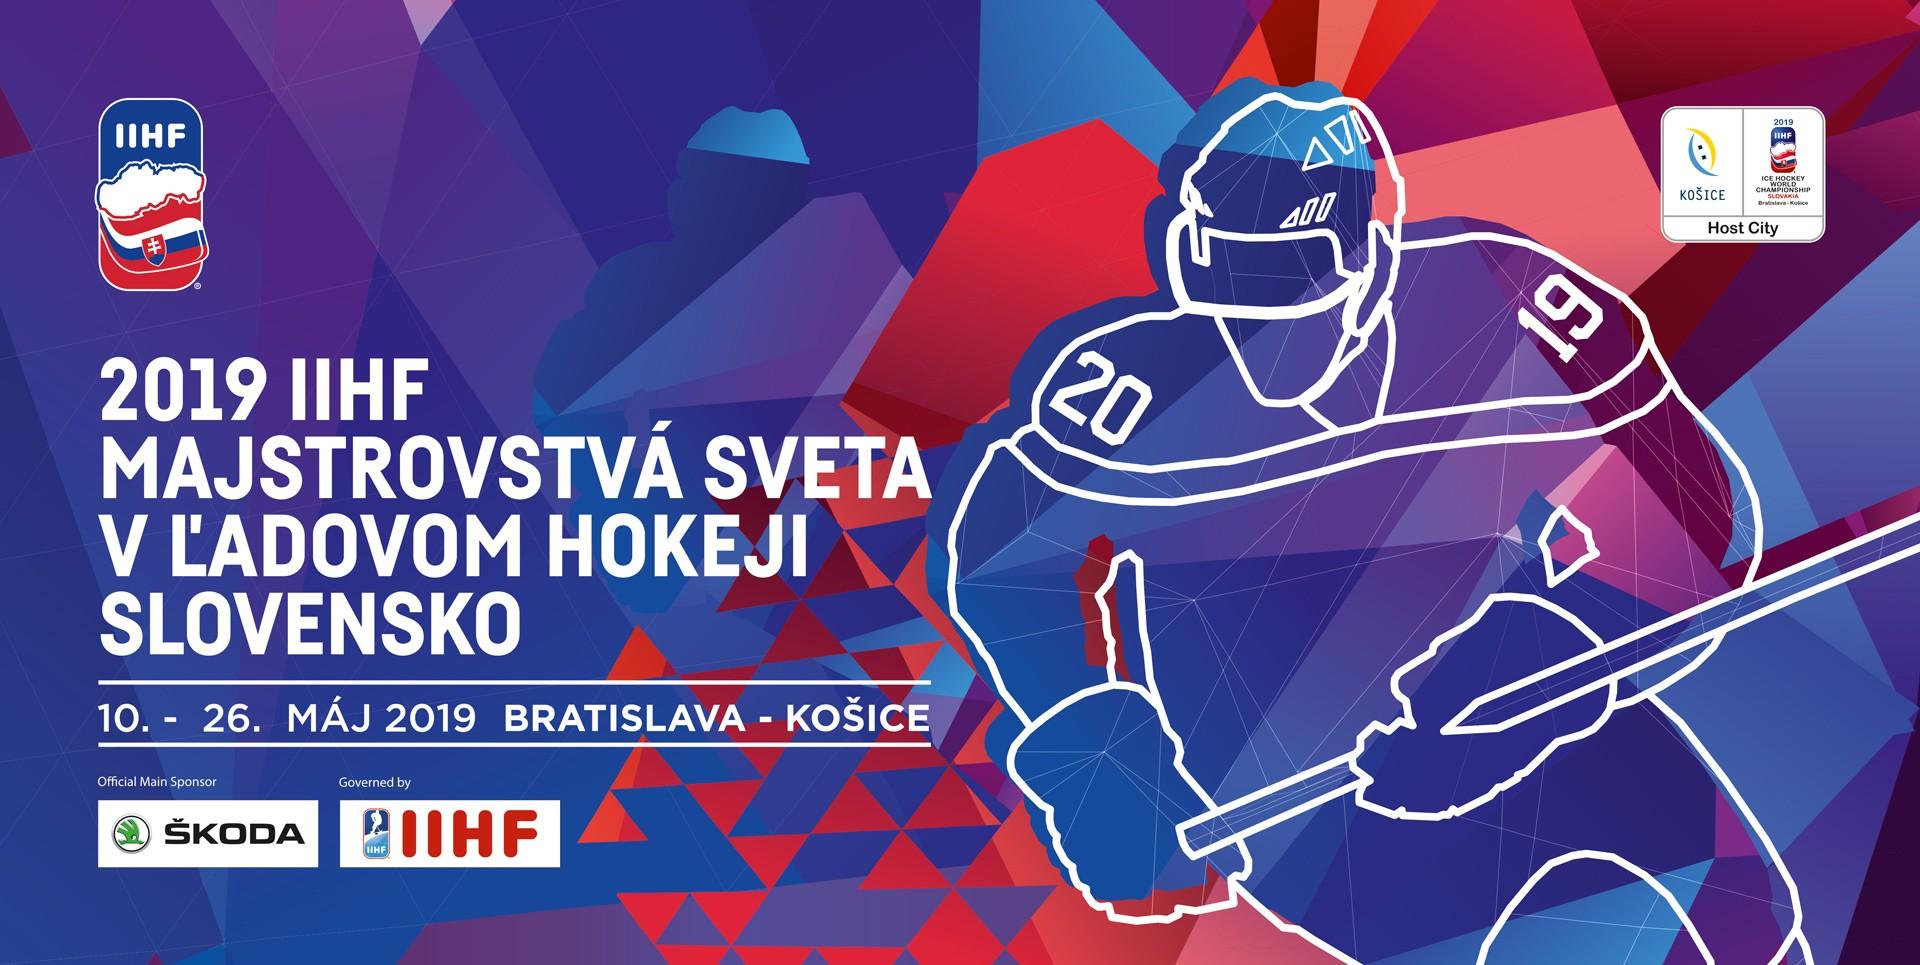 1e7869f0d STEEL ARENA - MS 2019 v hokeji